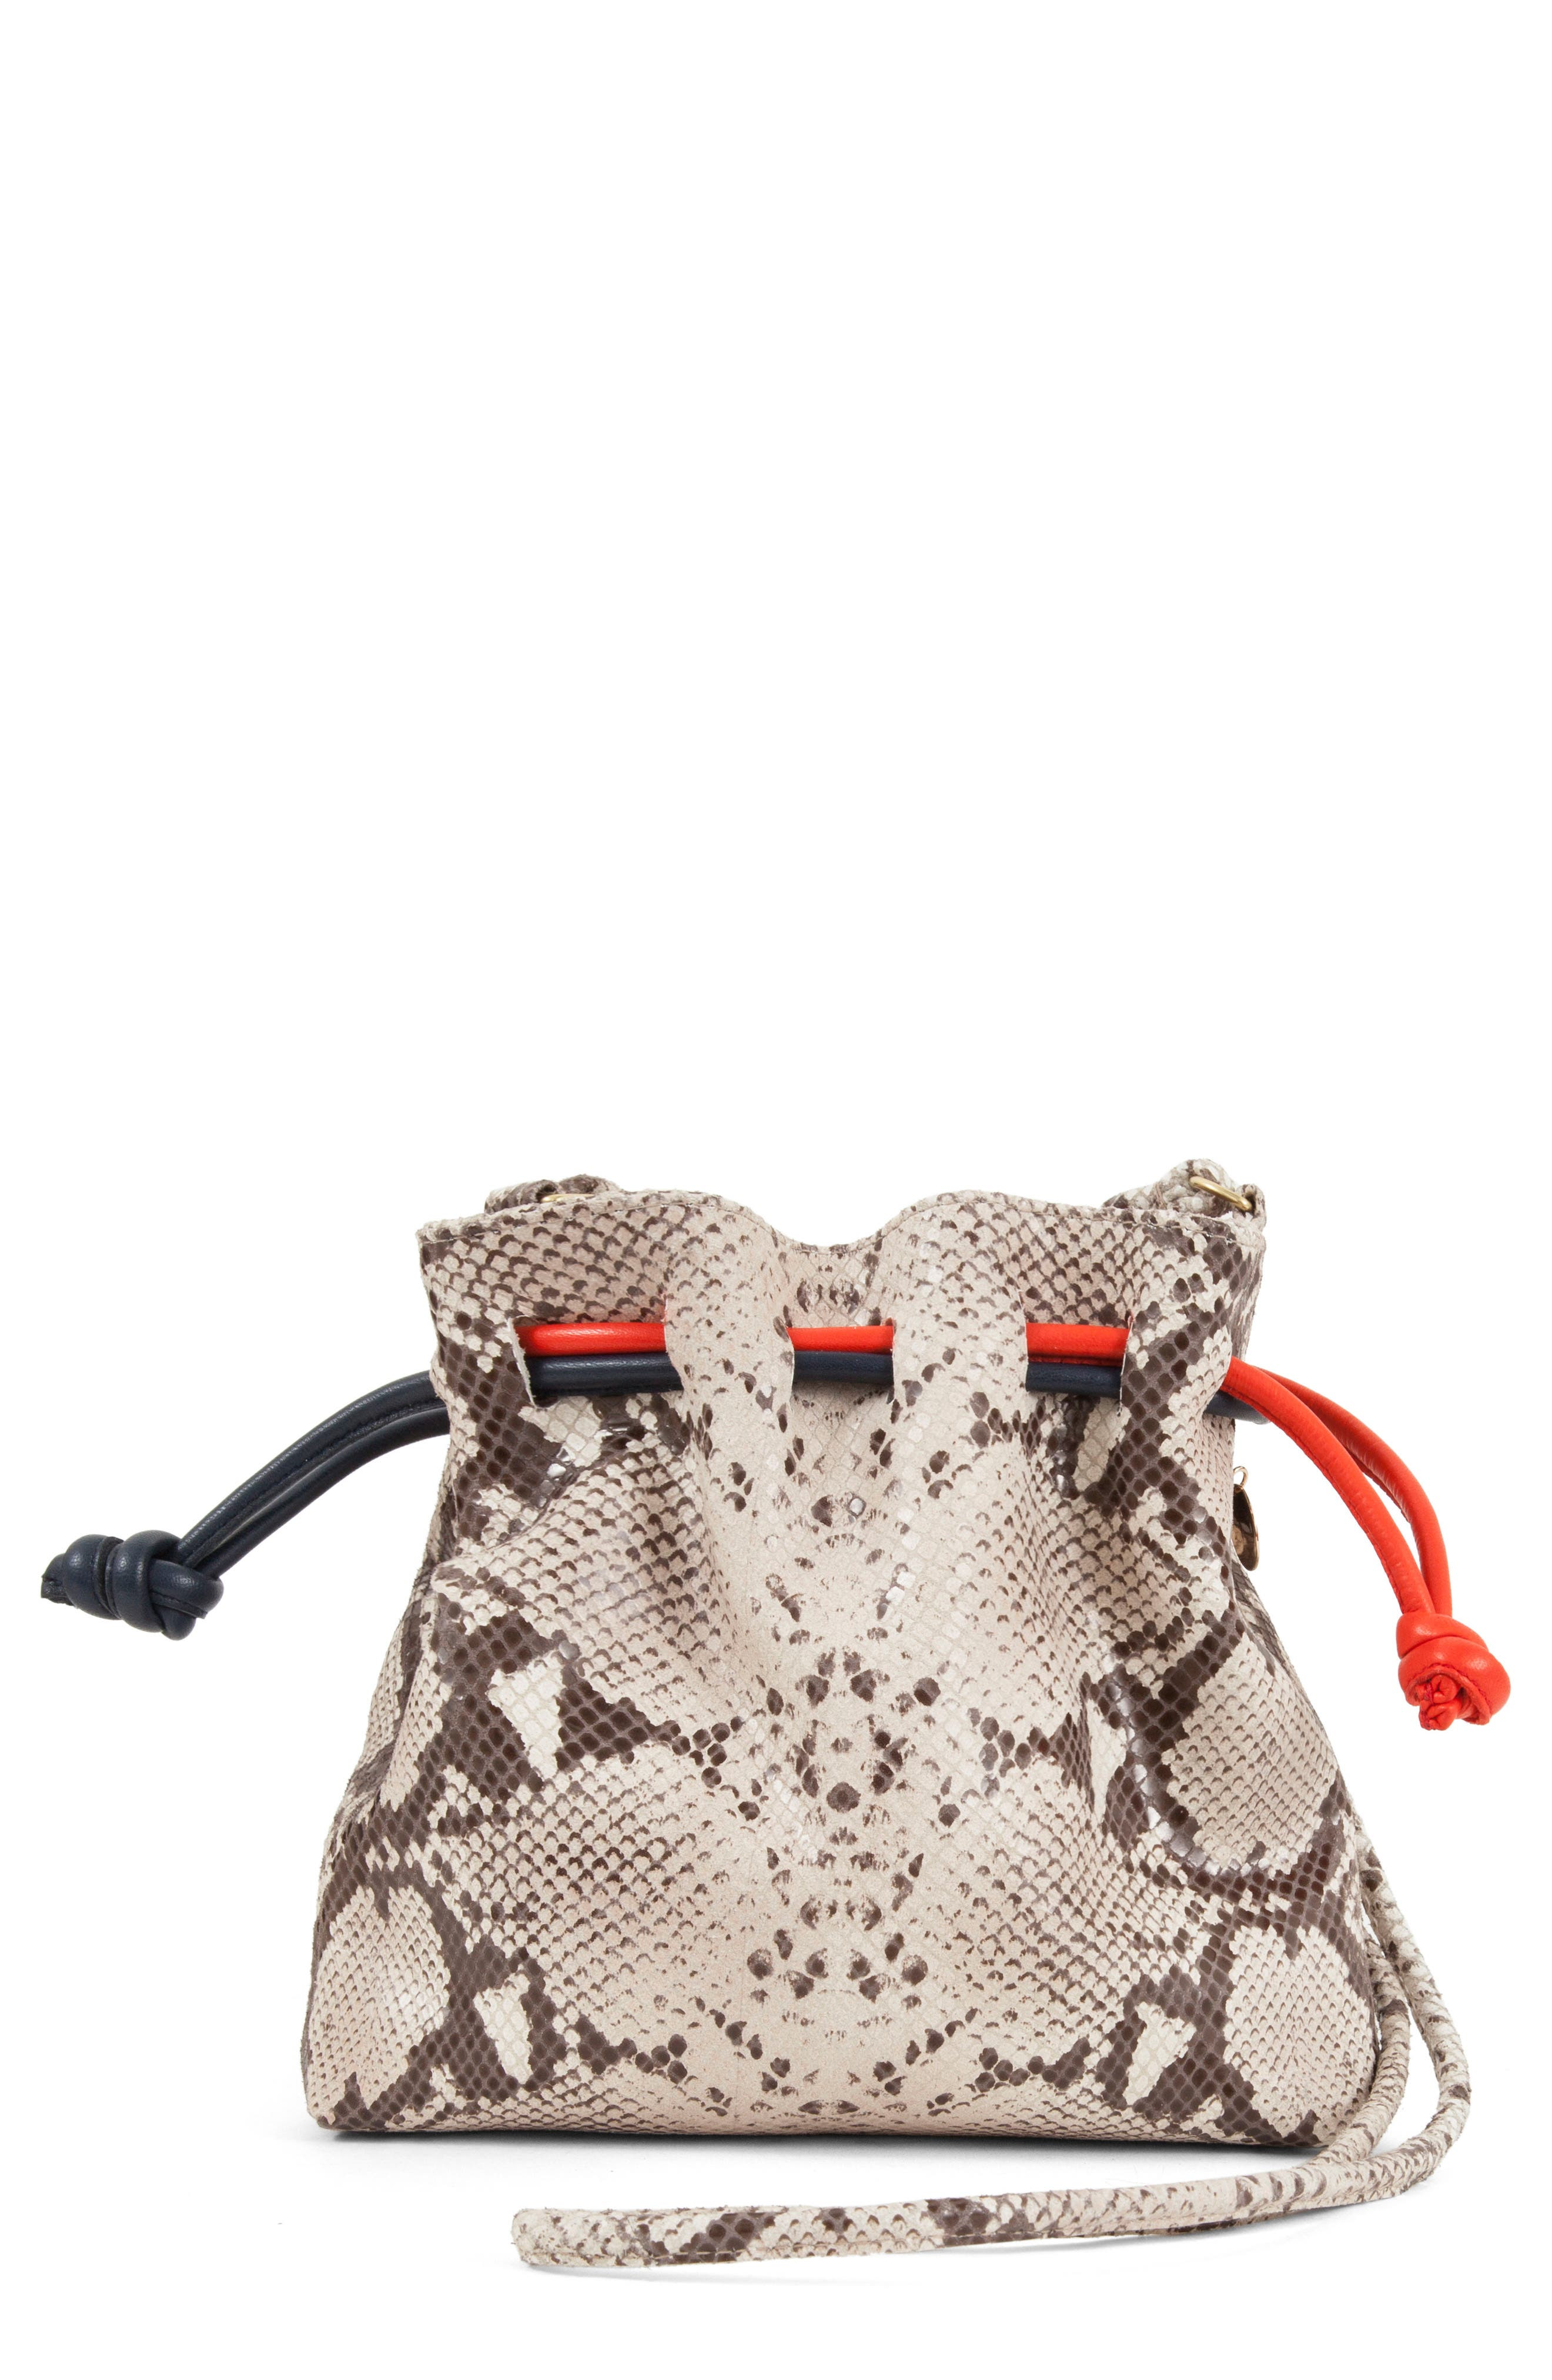 Petite Henri Supreme Snakeskin Embossed Leather Bucket Bag,                             Main thumbnail 1, color,                             210